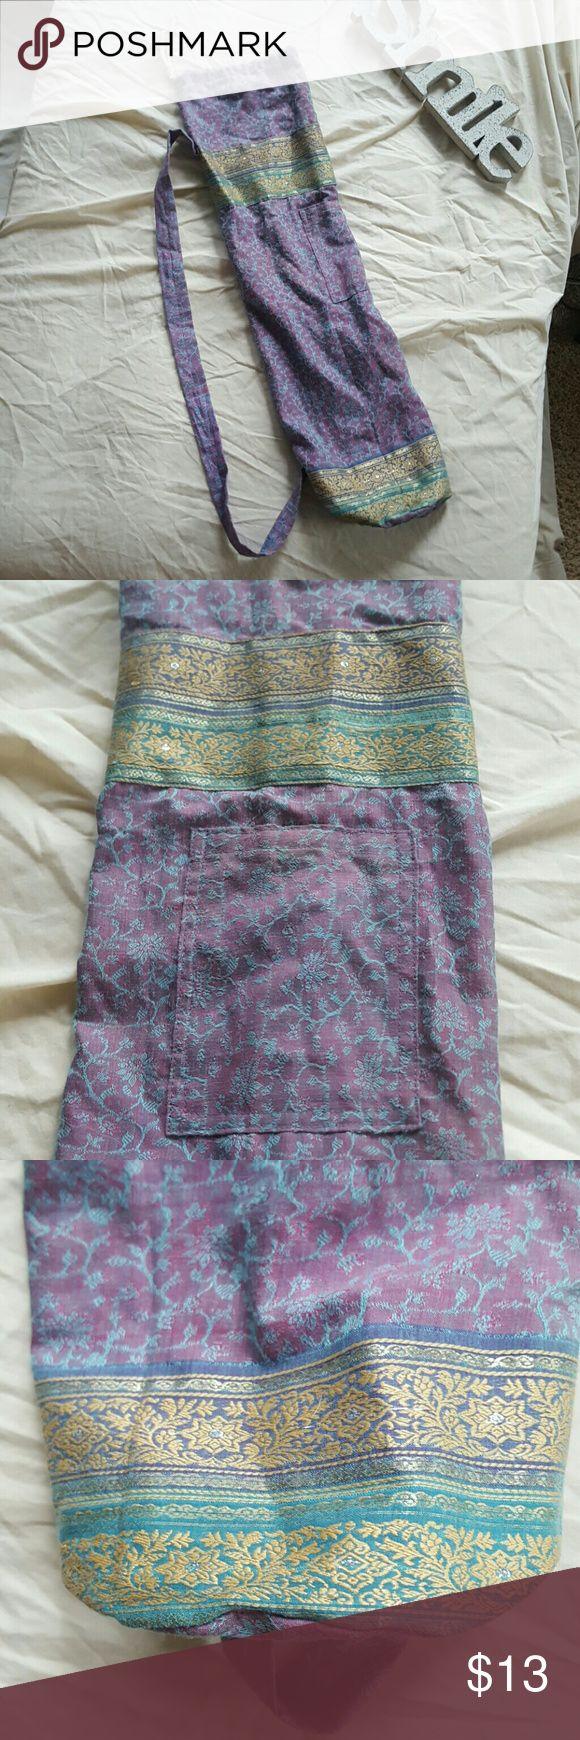 Yoga Mat Bag made of Recycled Saris Beautiful purple and blue cotton yoga bag made of recycled saris. Has small exterior pocket, drawstring at top. Unique and cute! :-) Bags